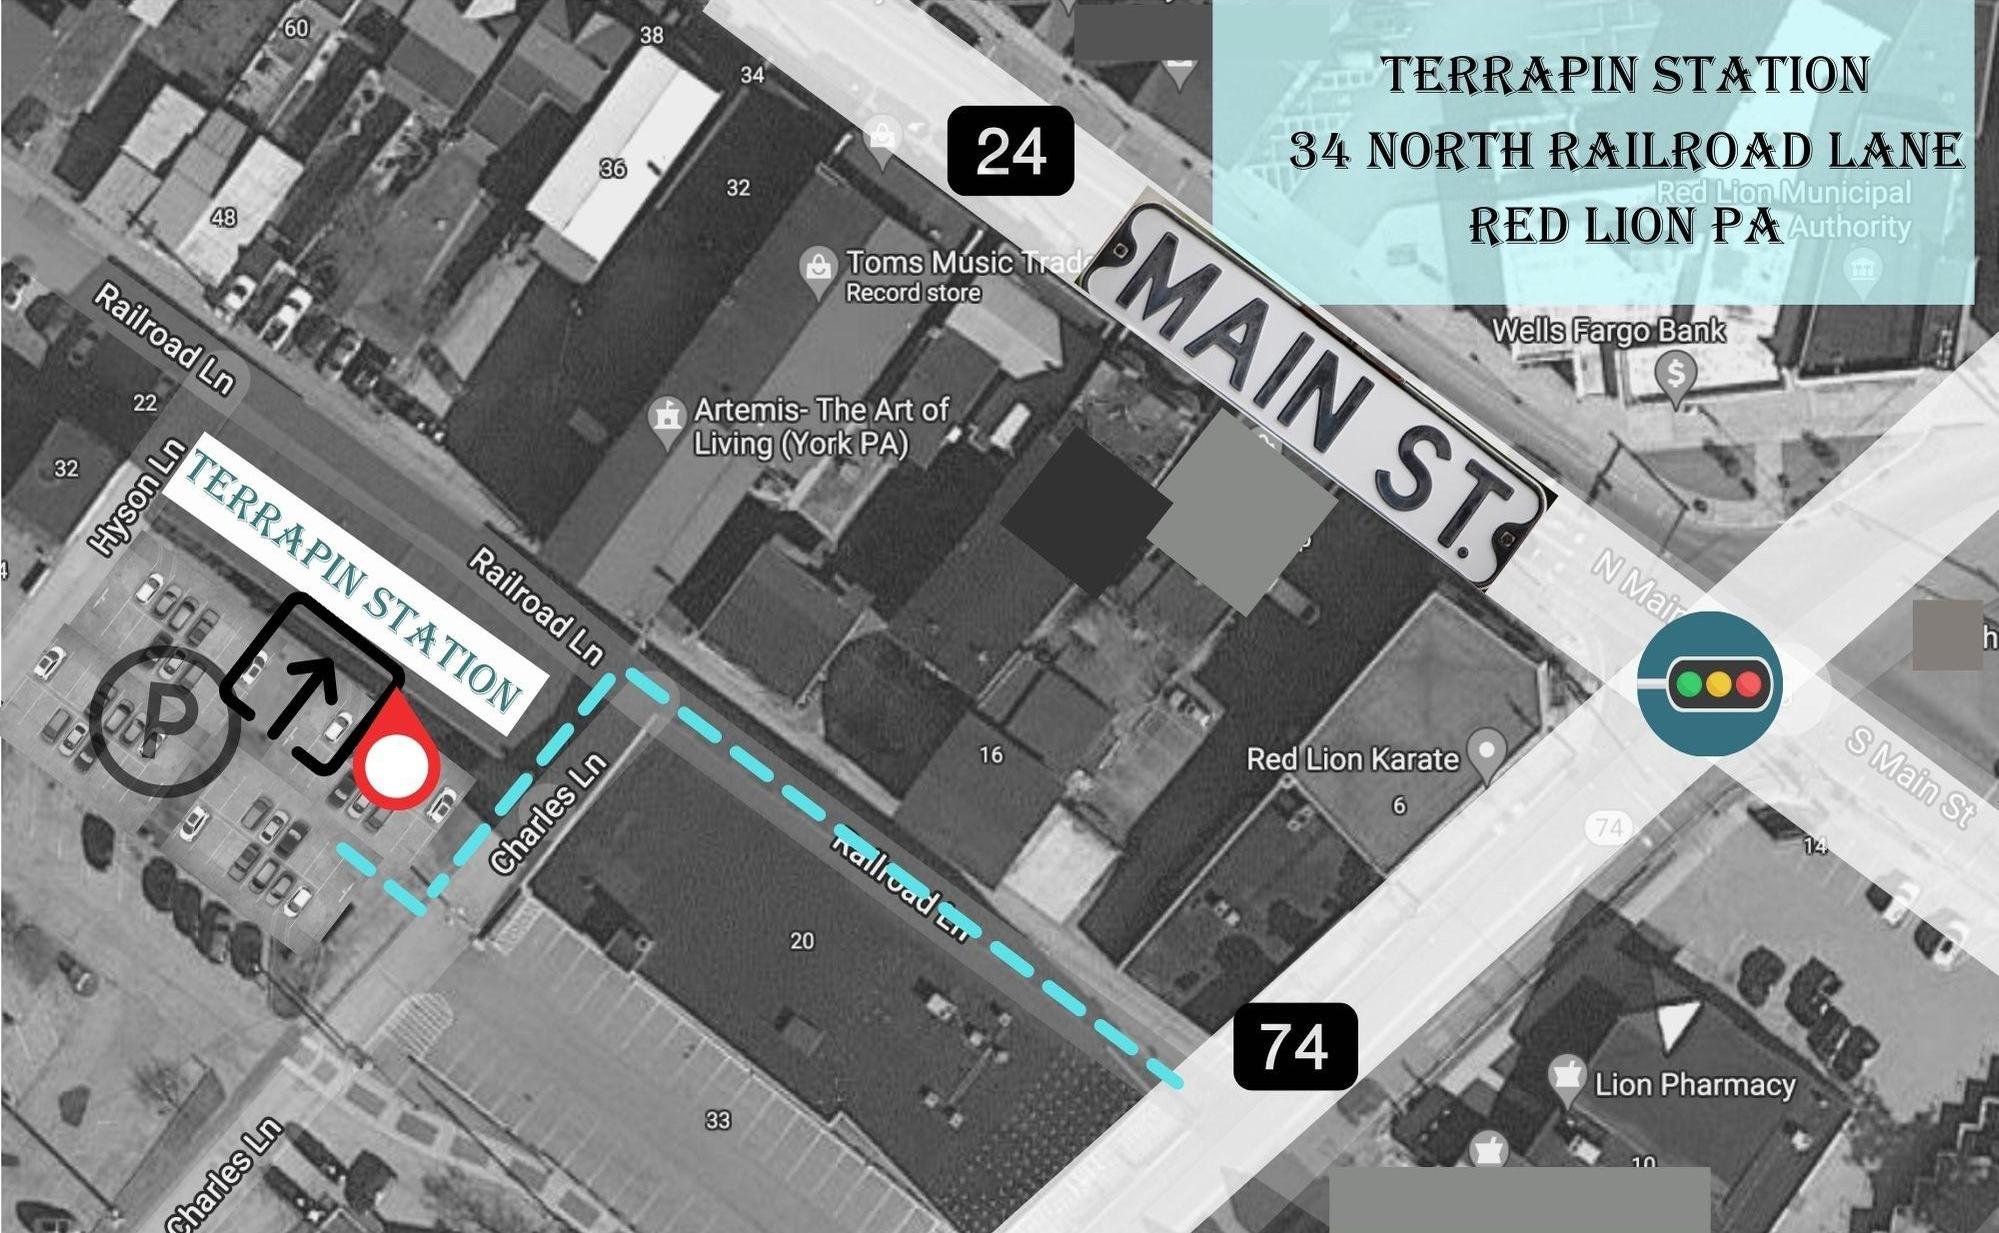 terrapin station parking